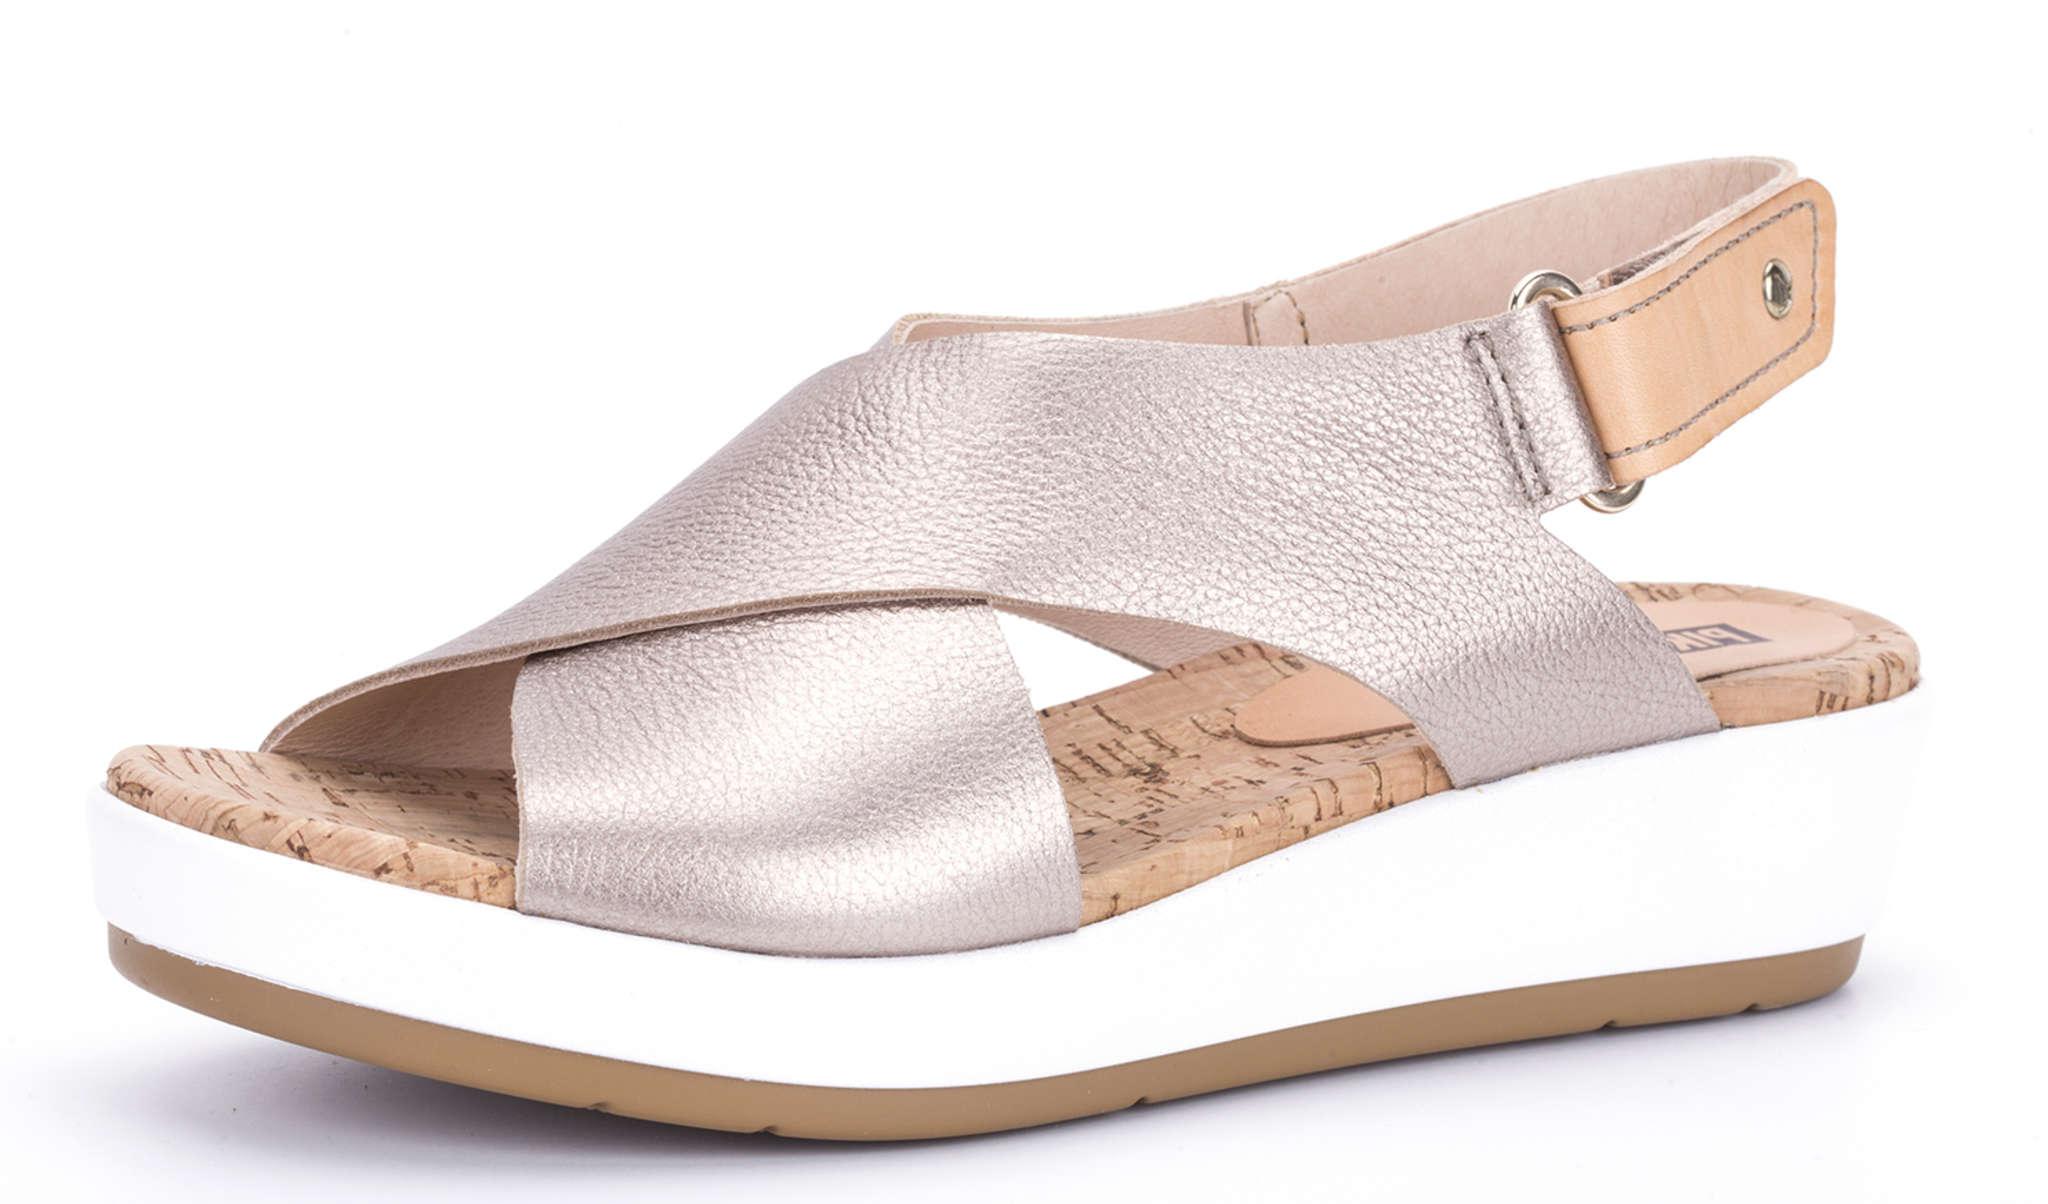 Metallic slip-ons and sneakers add glamour. Pikolinos Mykonos, $150, www.pikolinos.com